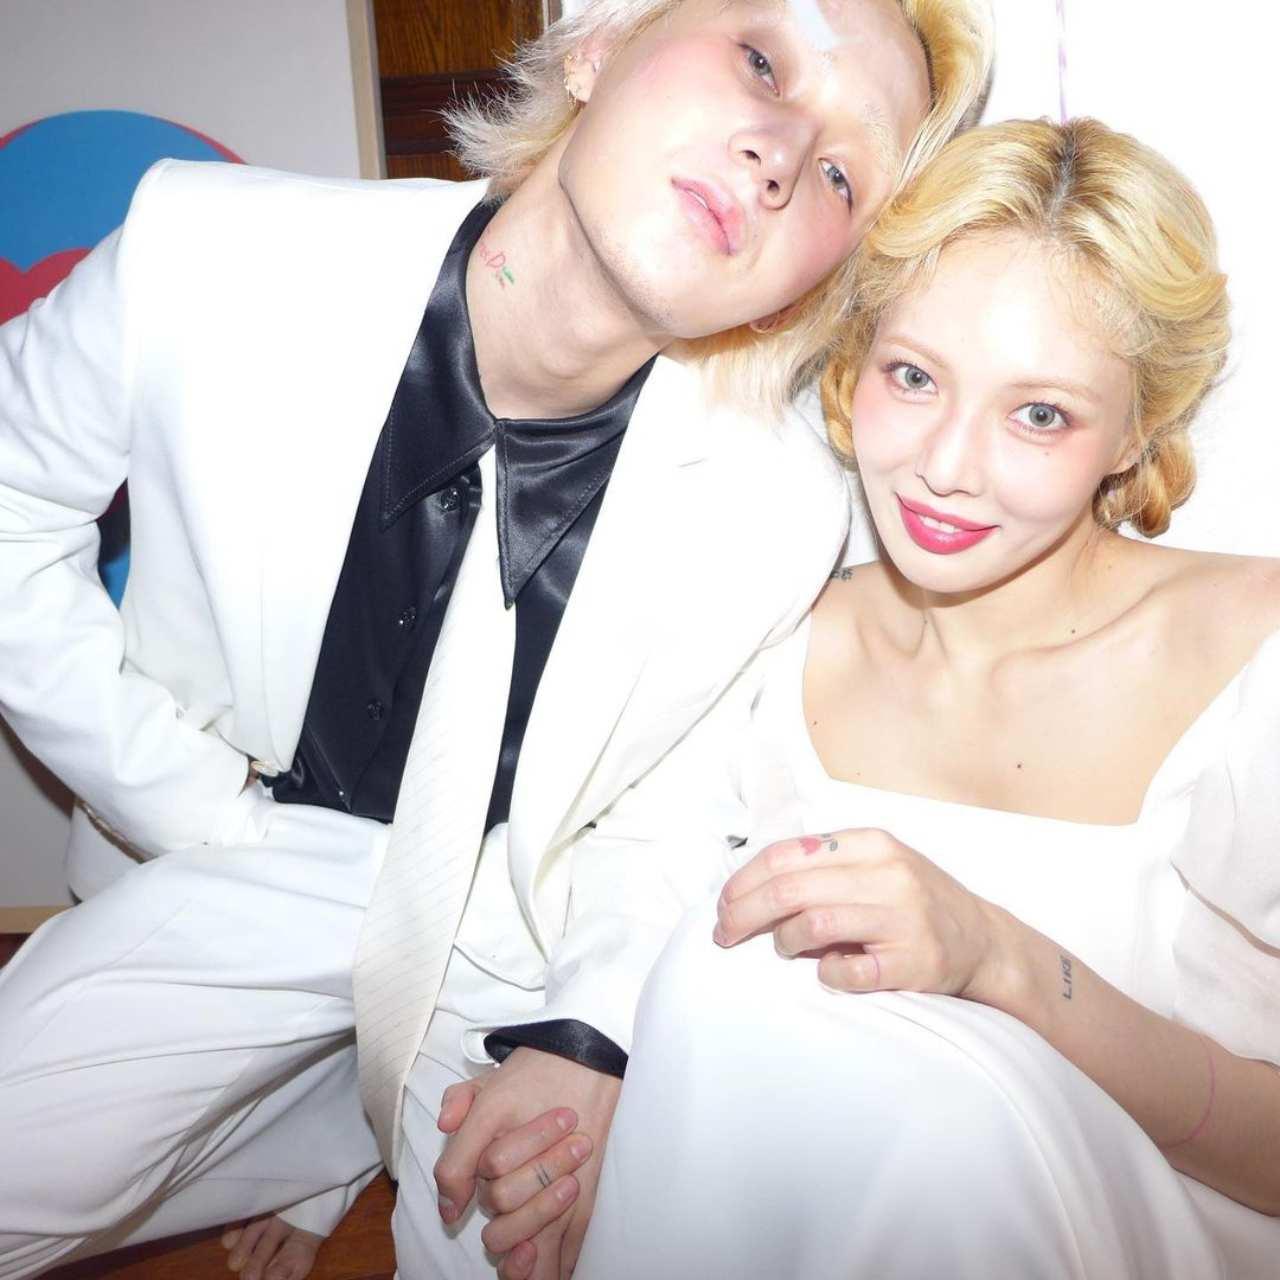 Hyun y Dawm se casaron sin avisar